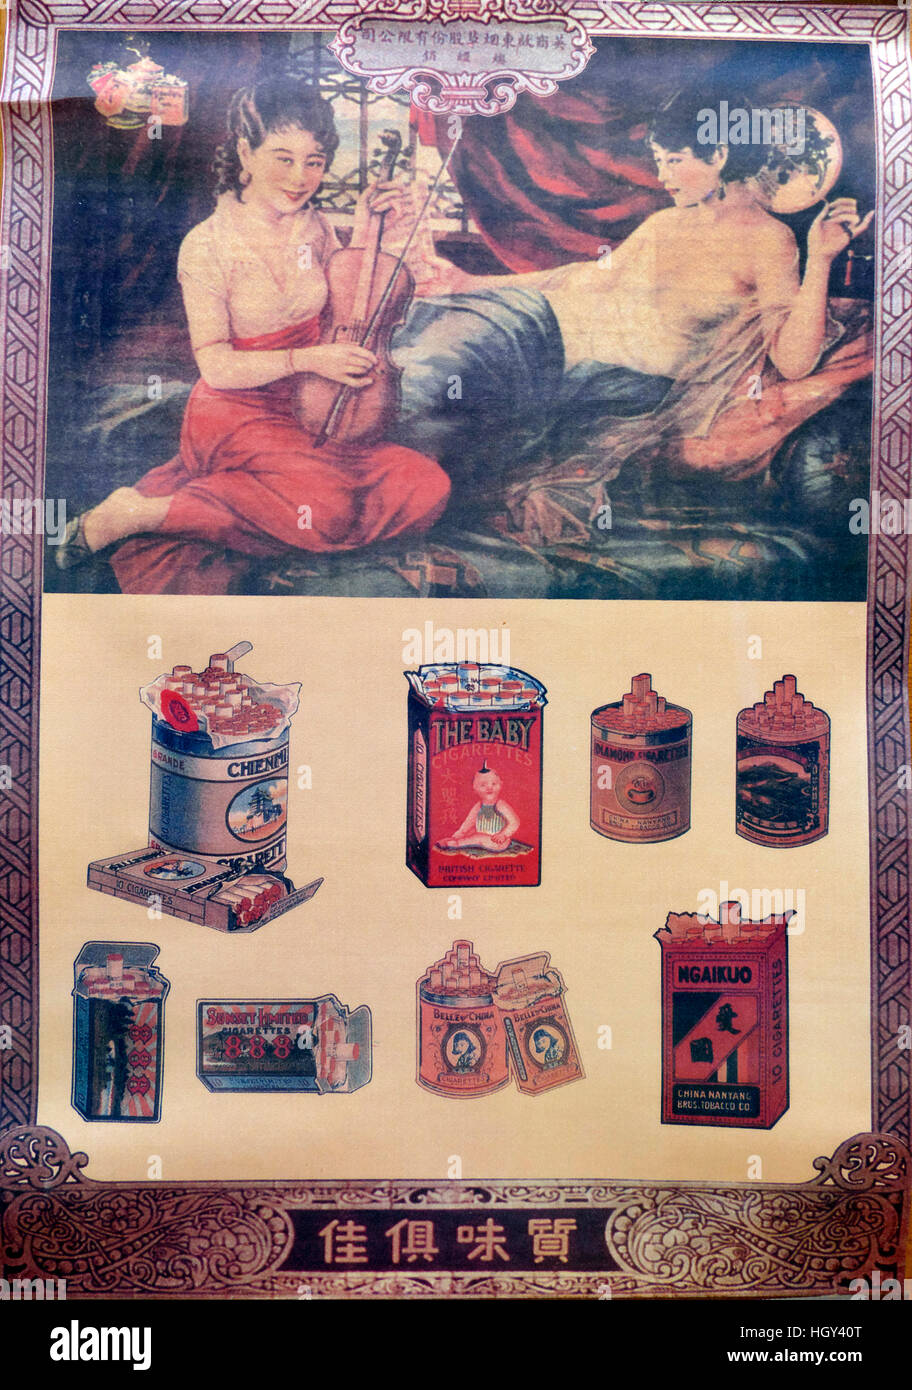 Vintage poster Cigarette chinois nostalgique Photo Stock